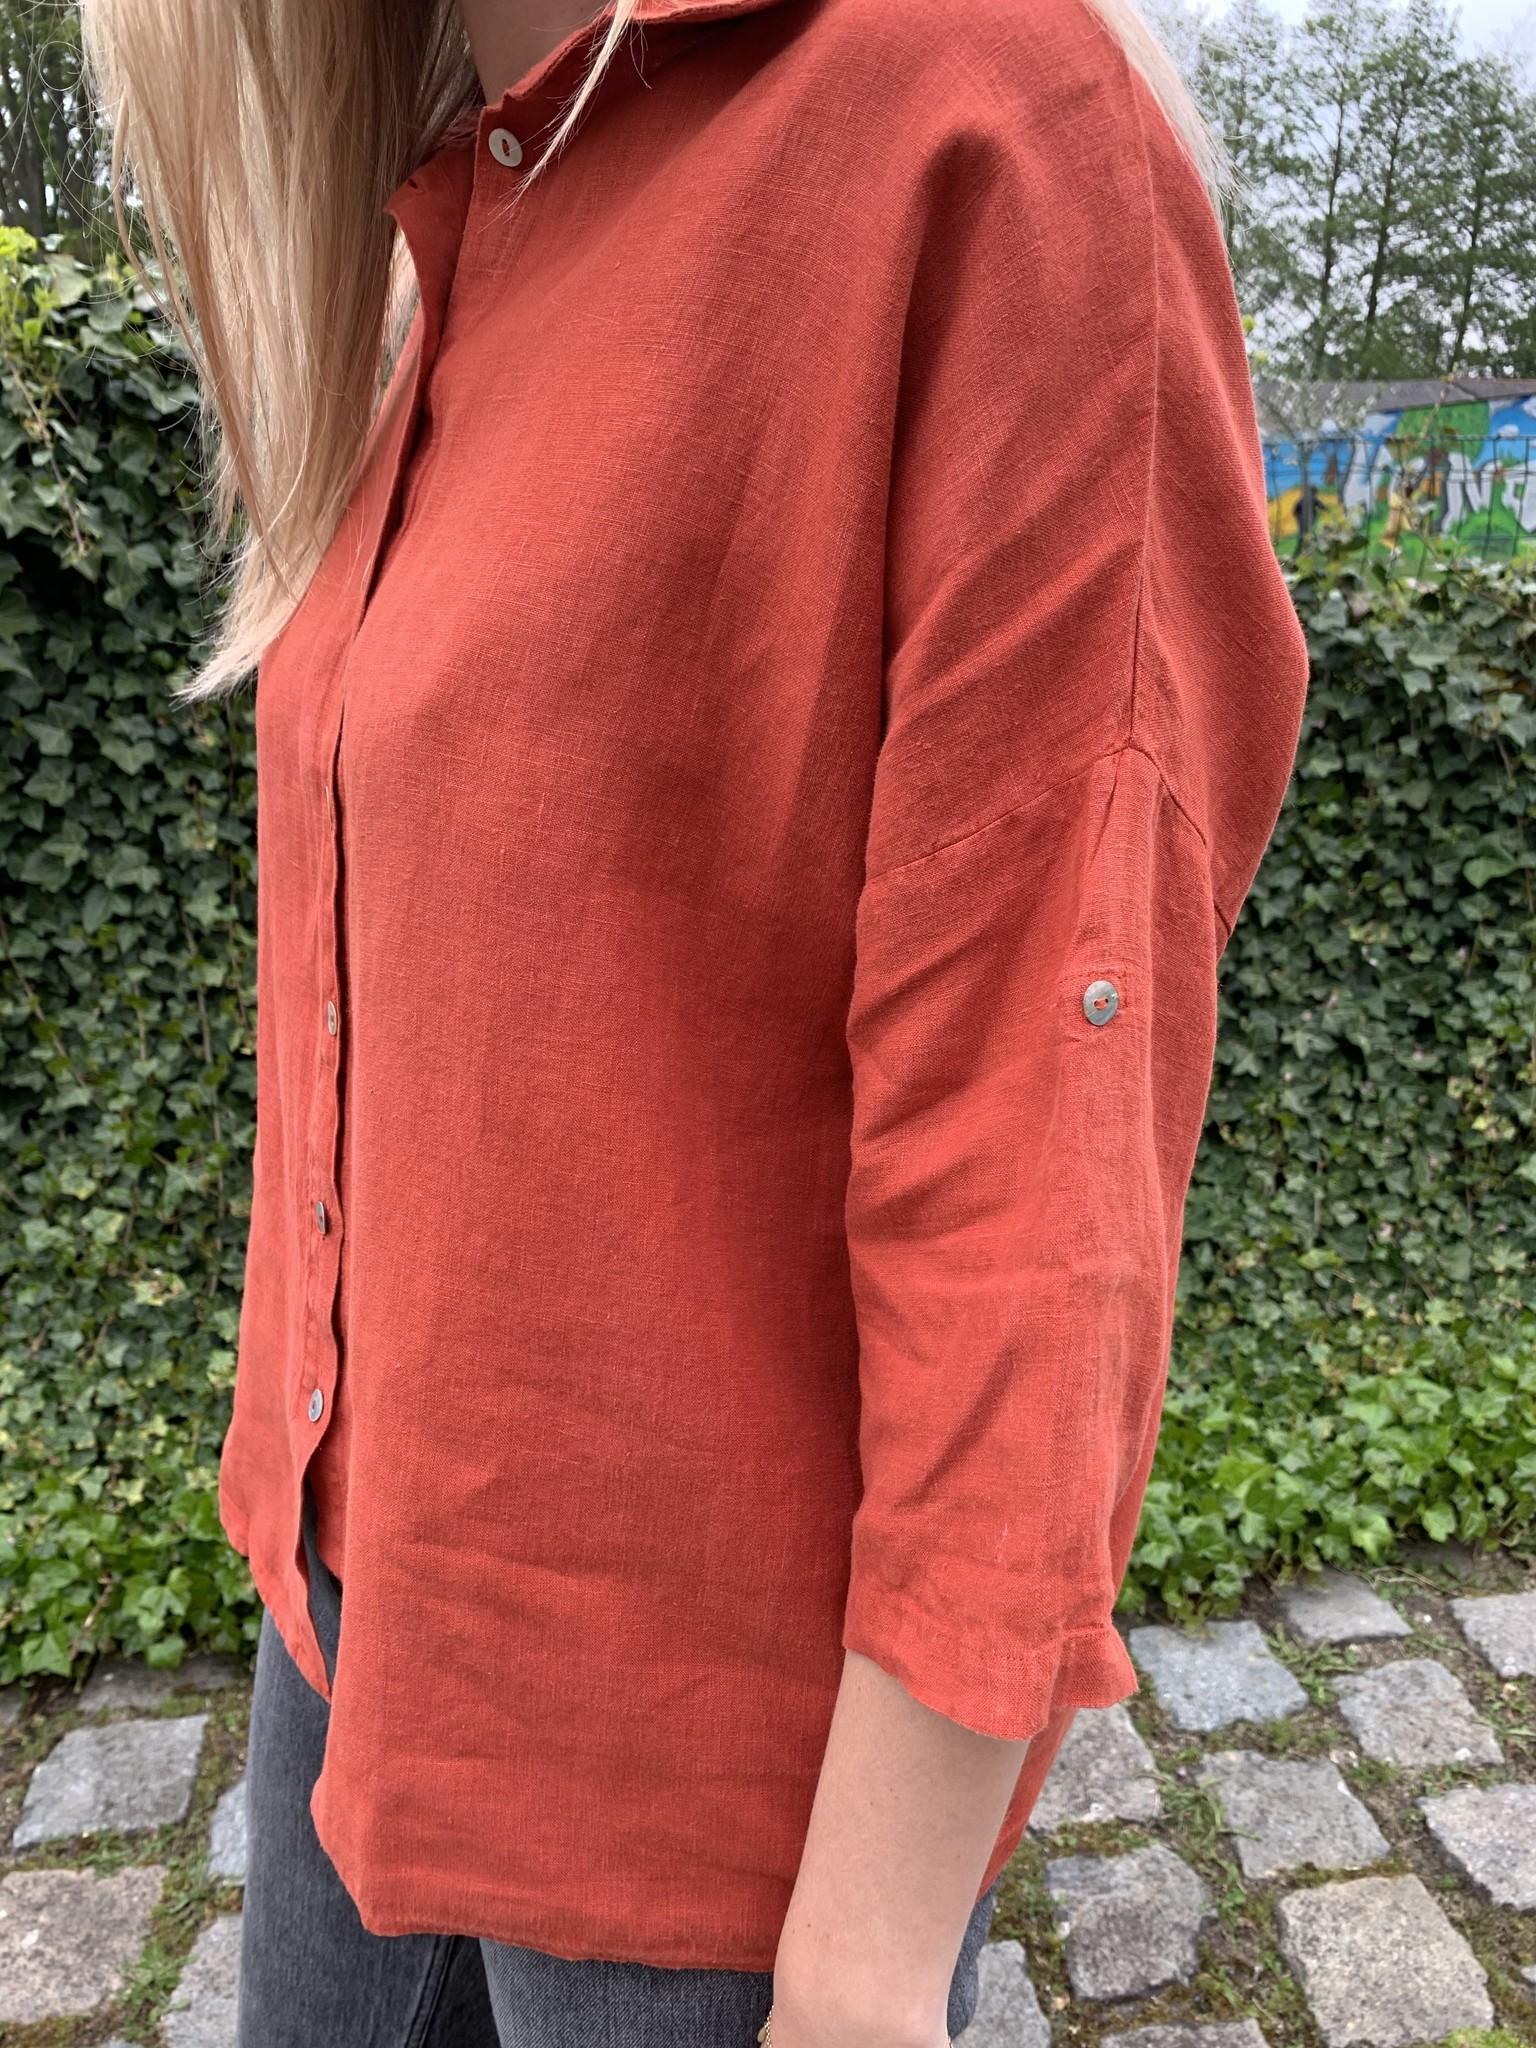 grote blouse van rood linnen